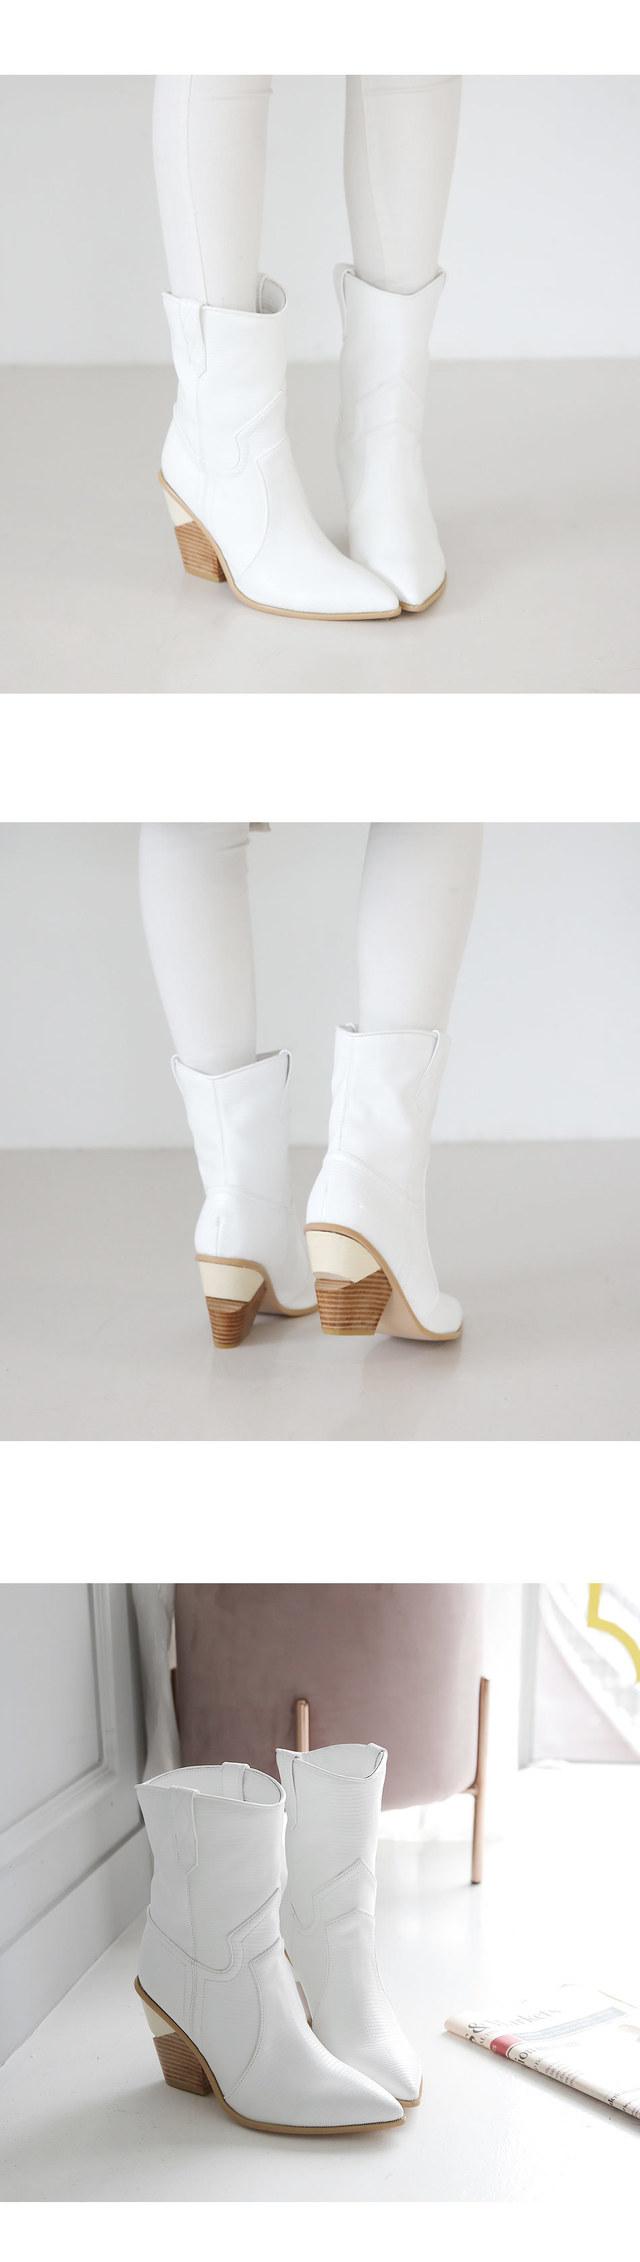 Karon's Western Boots 9.5cm